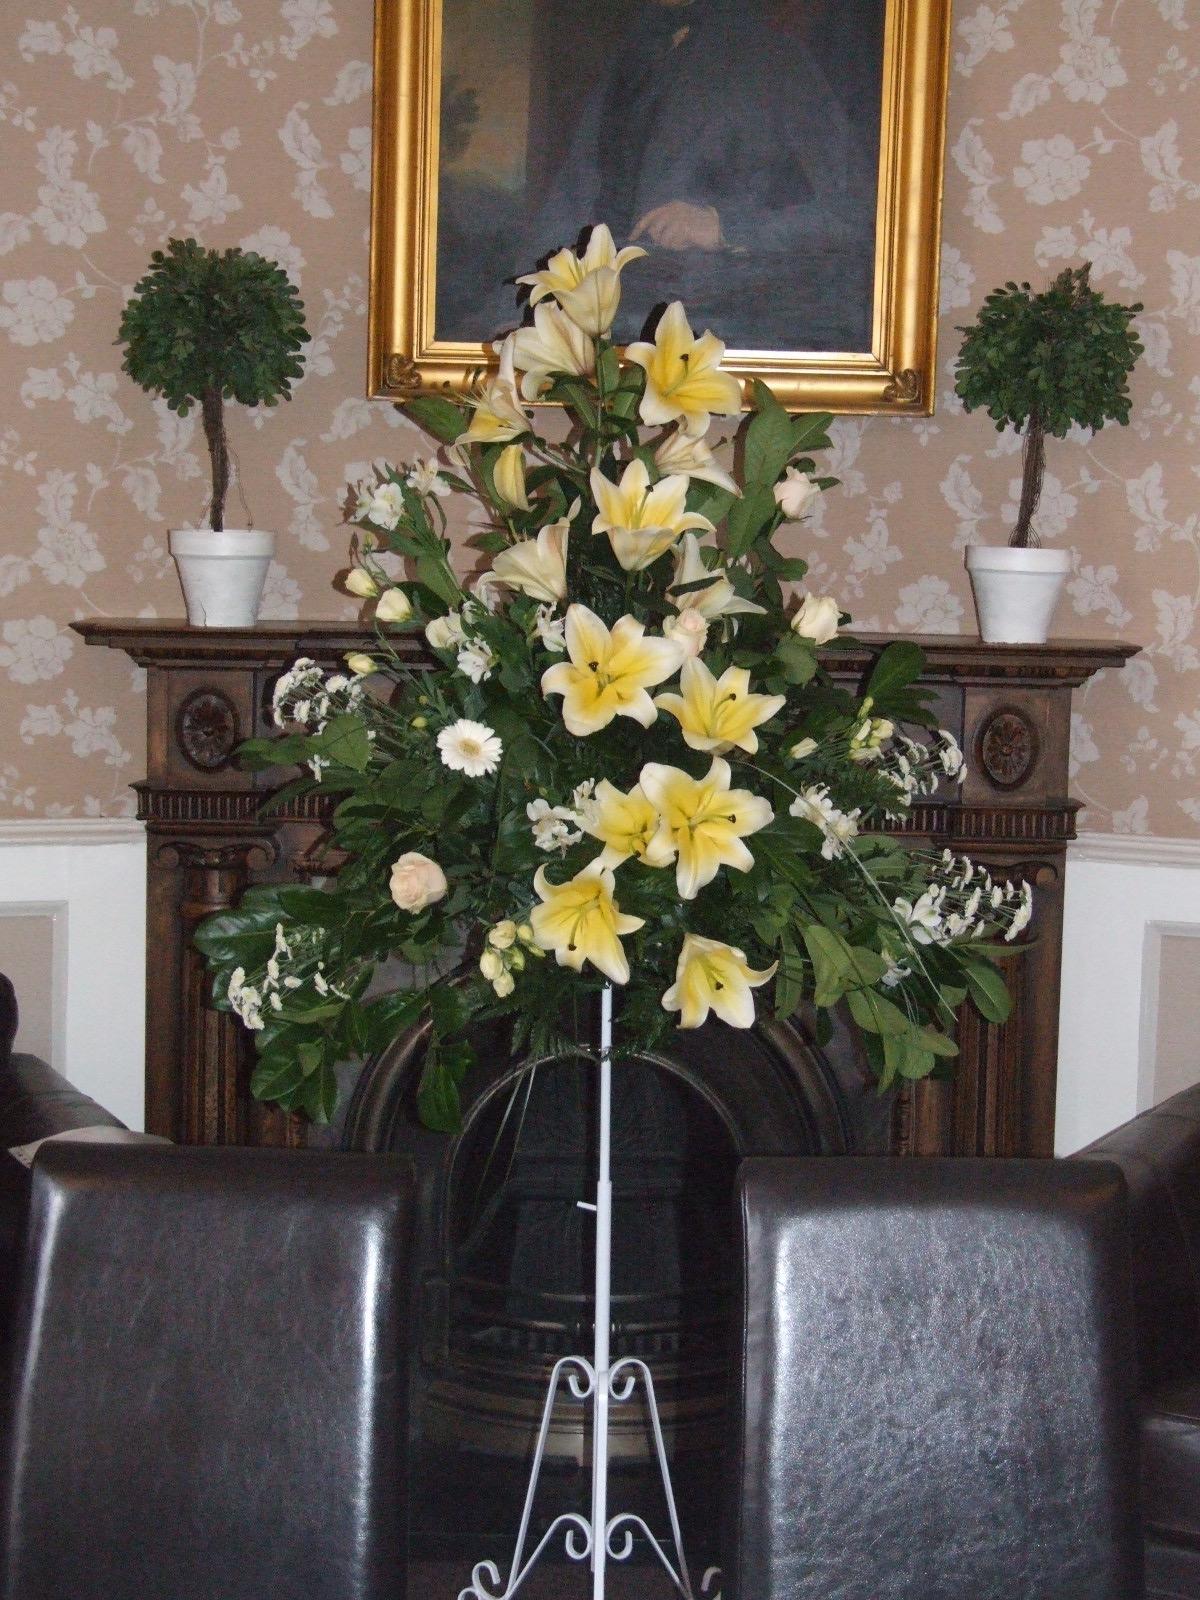 sandra 39 s flower studio charlotte house hotel wedding flowers. Black Bedroom Furniture Sets. Home Design Ideas